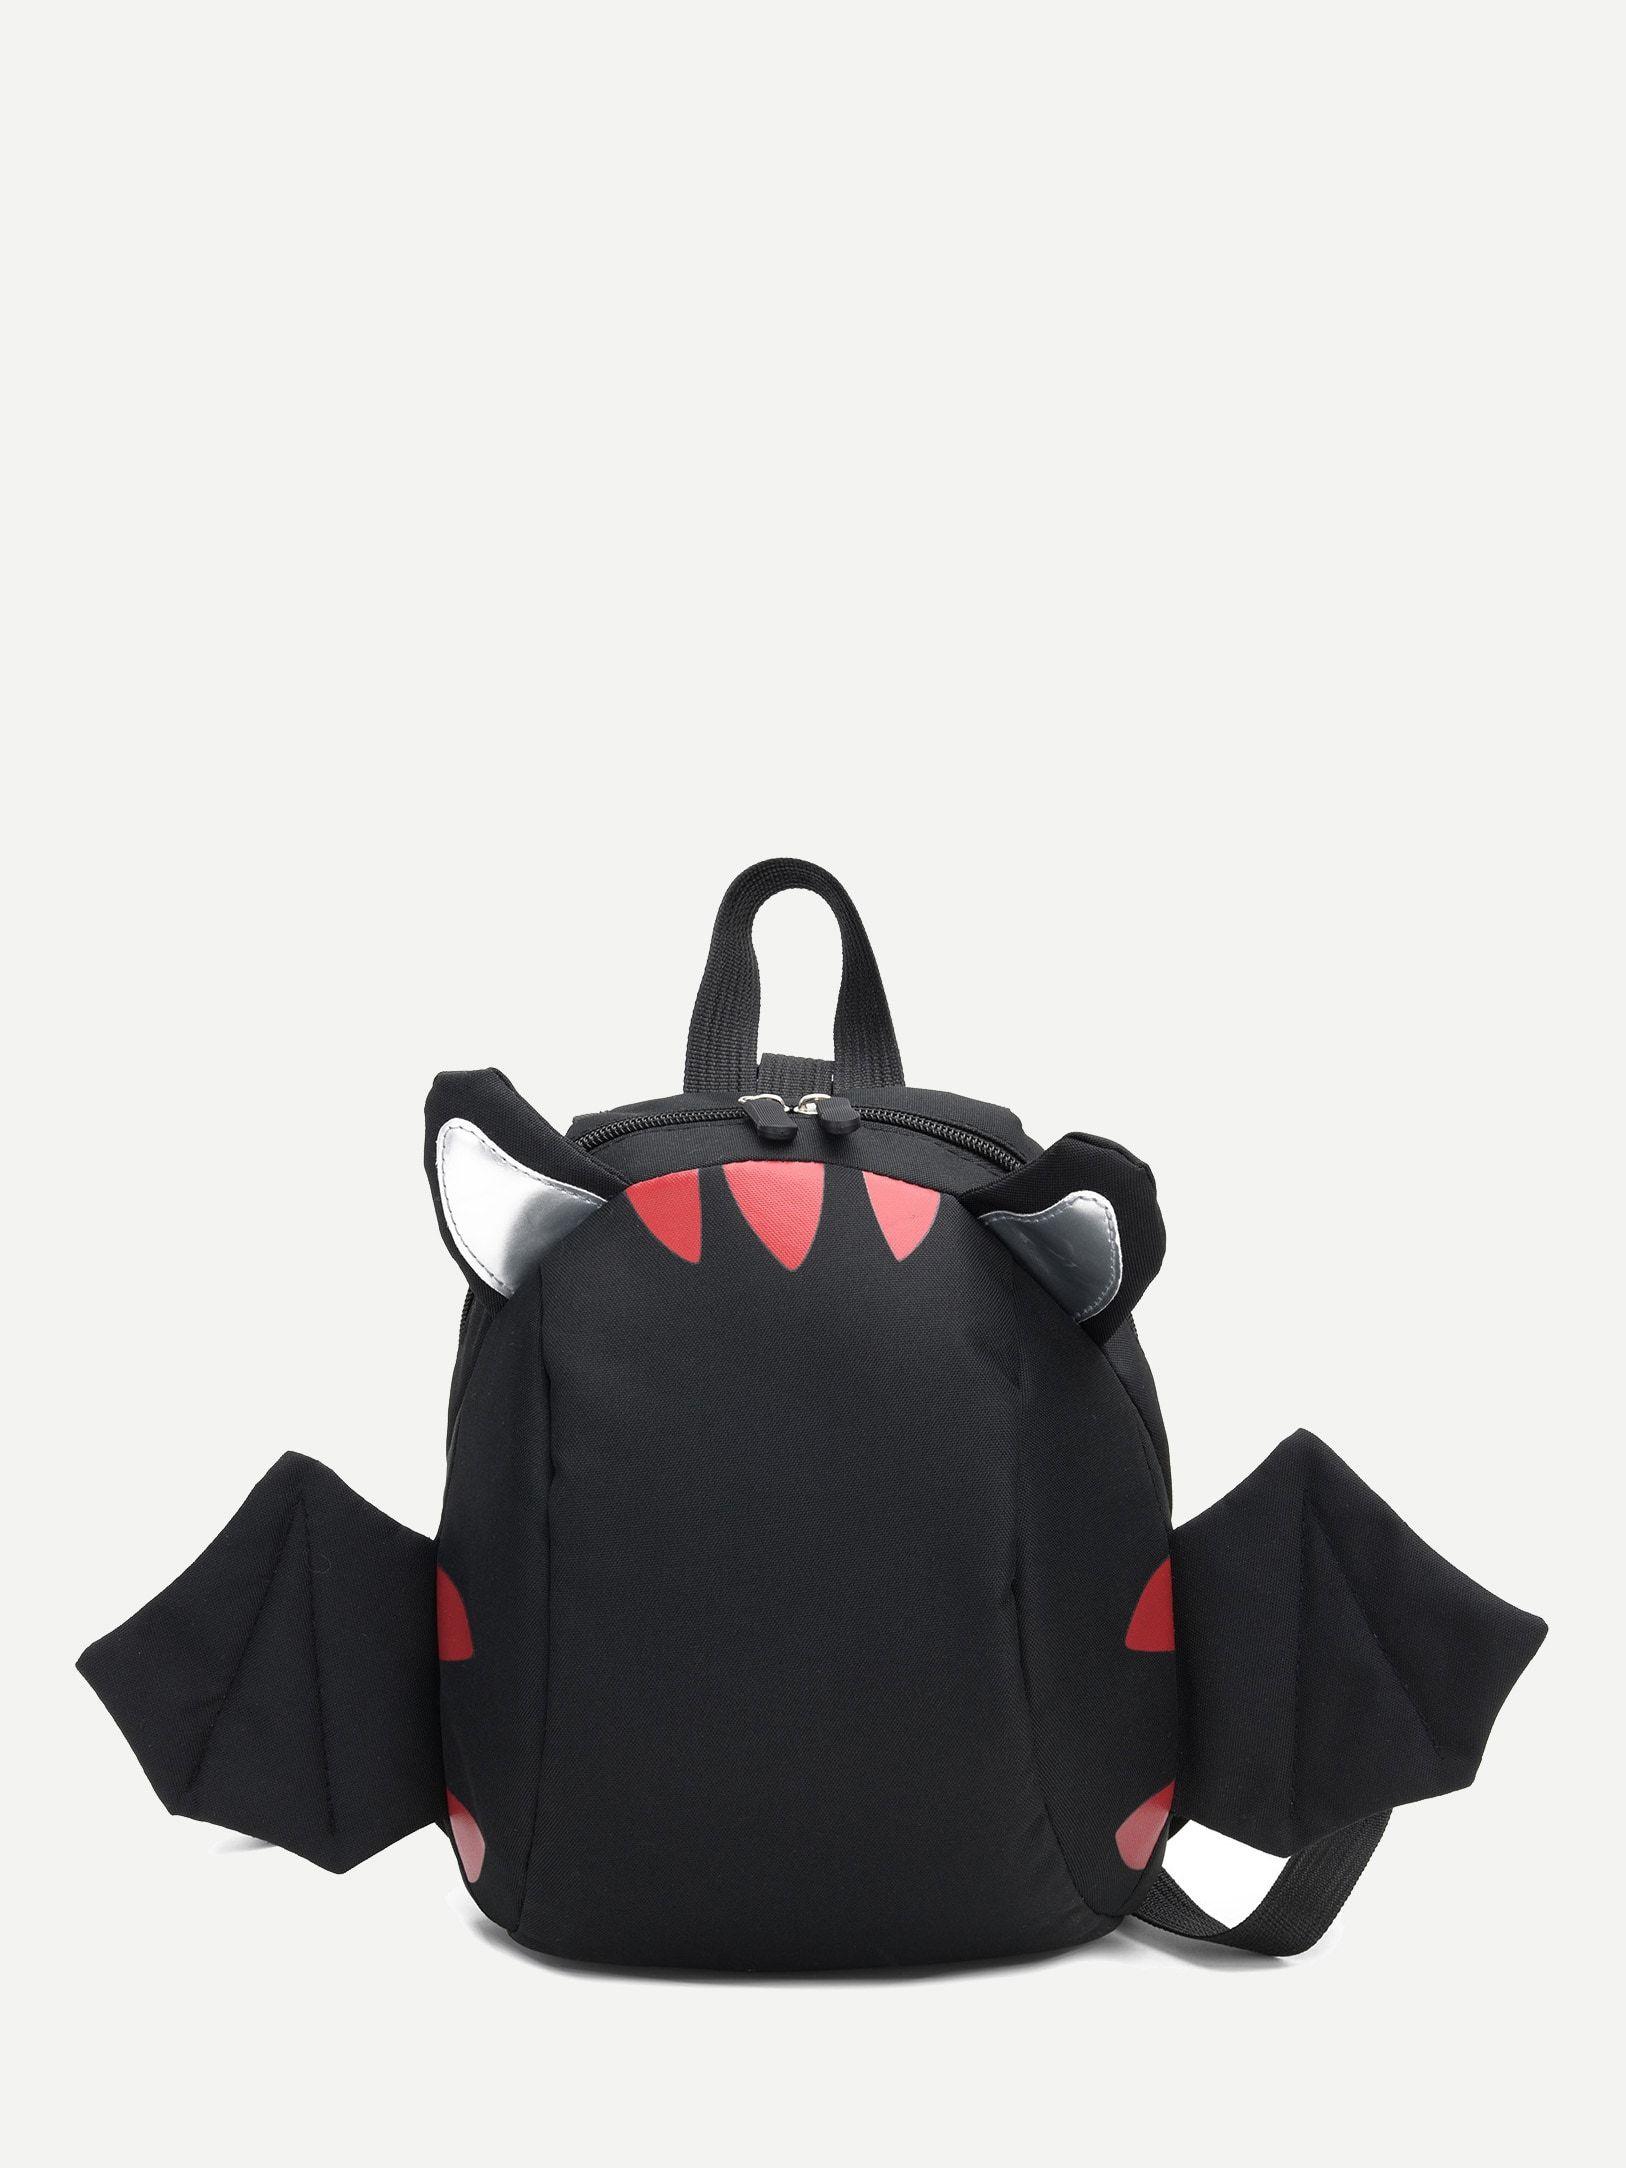 71c61b7e15 Kids Wings Decor Nylon Backpack #bag #bags #man #woman #fashion #